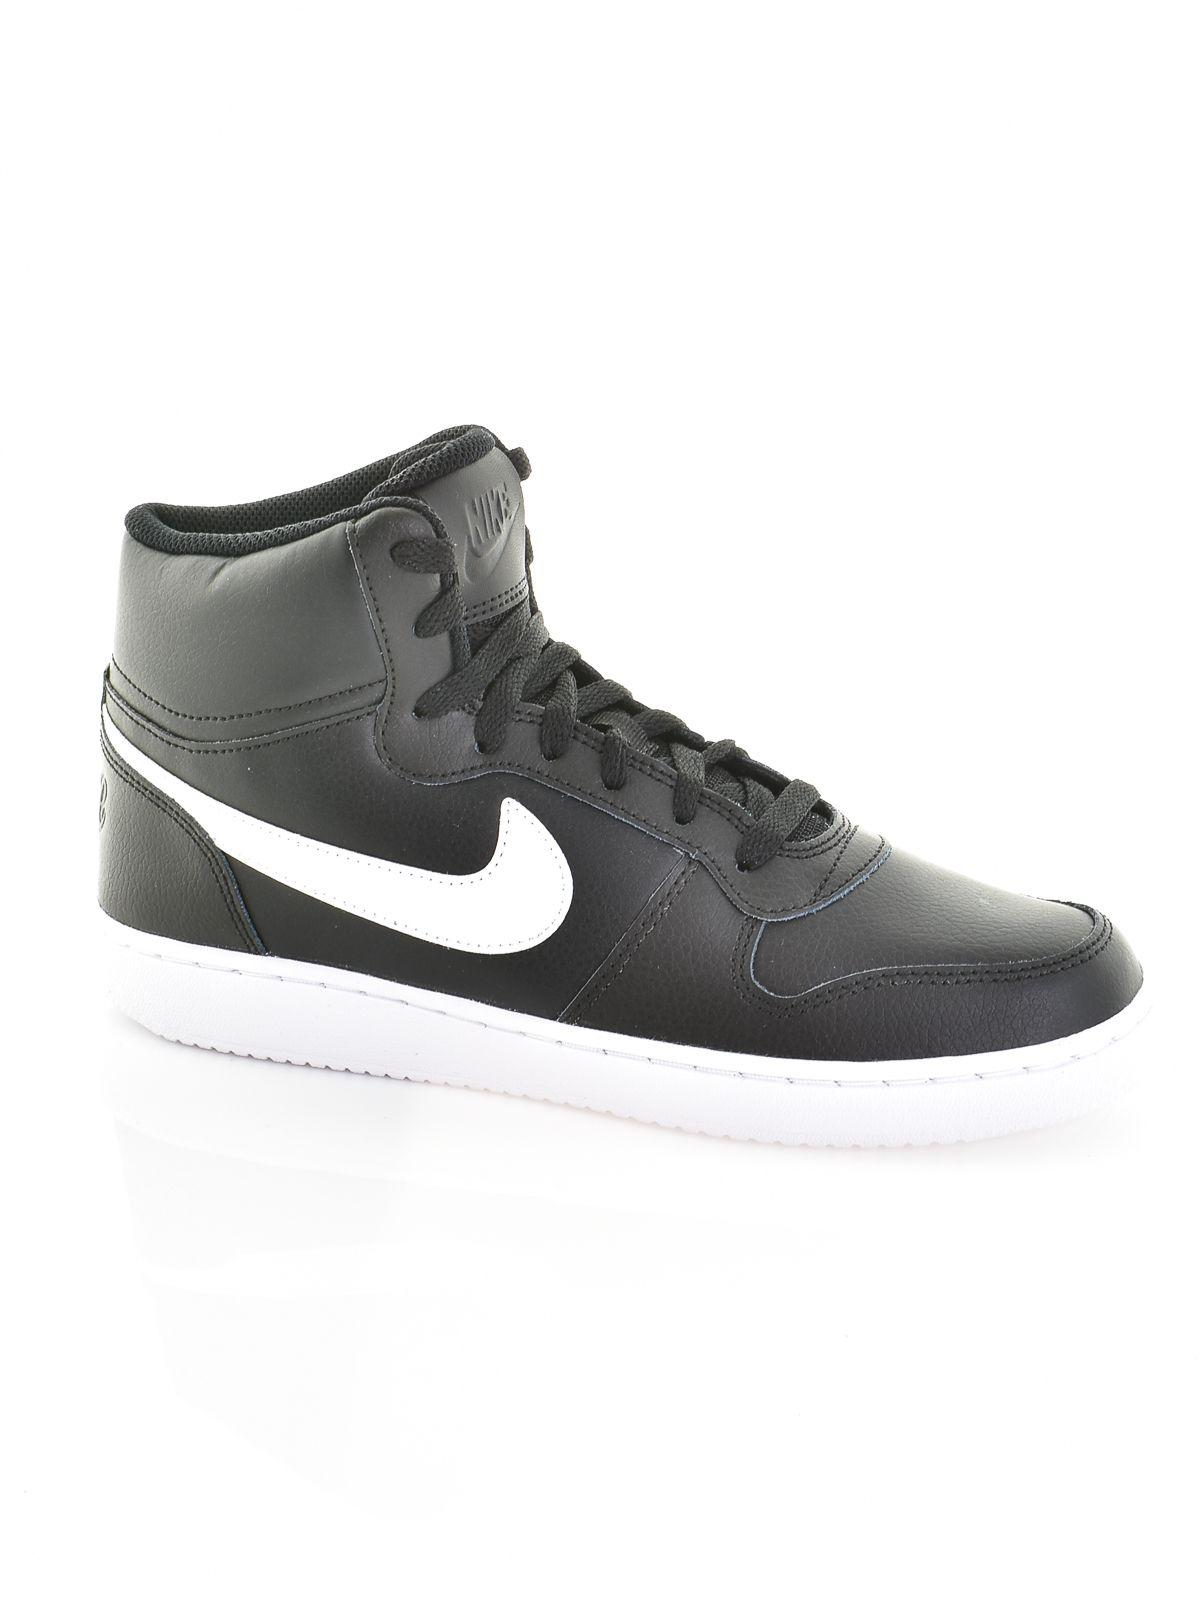 Nike WMNS Ebernon MID utcai cipő